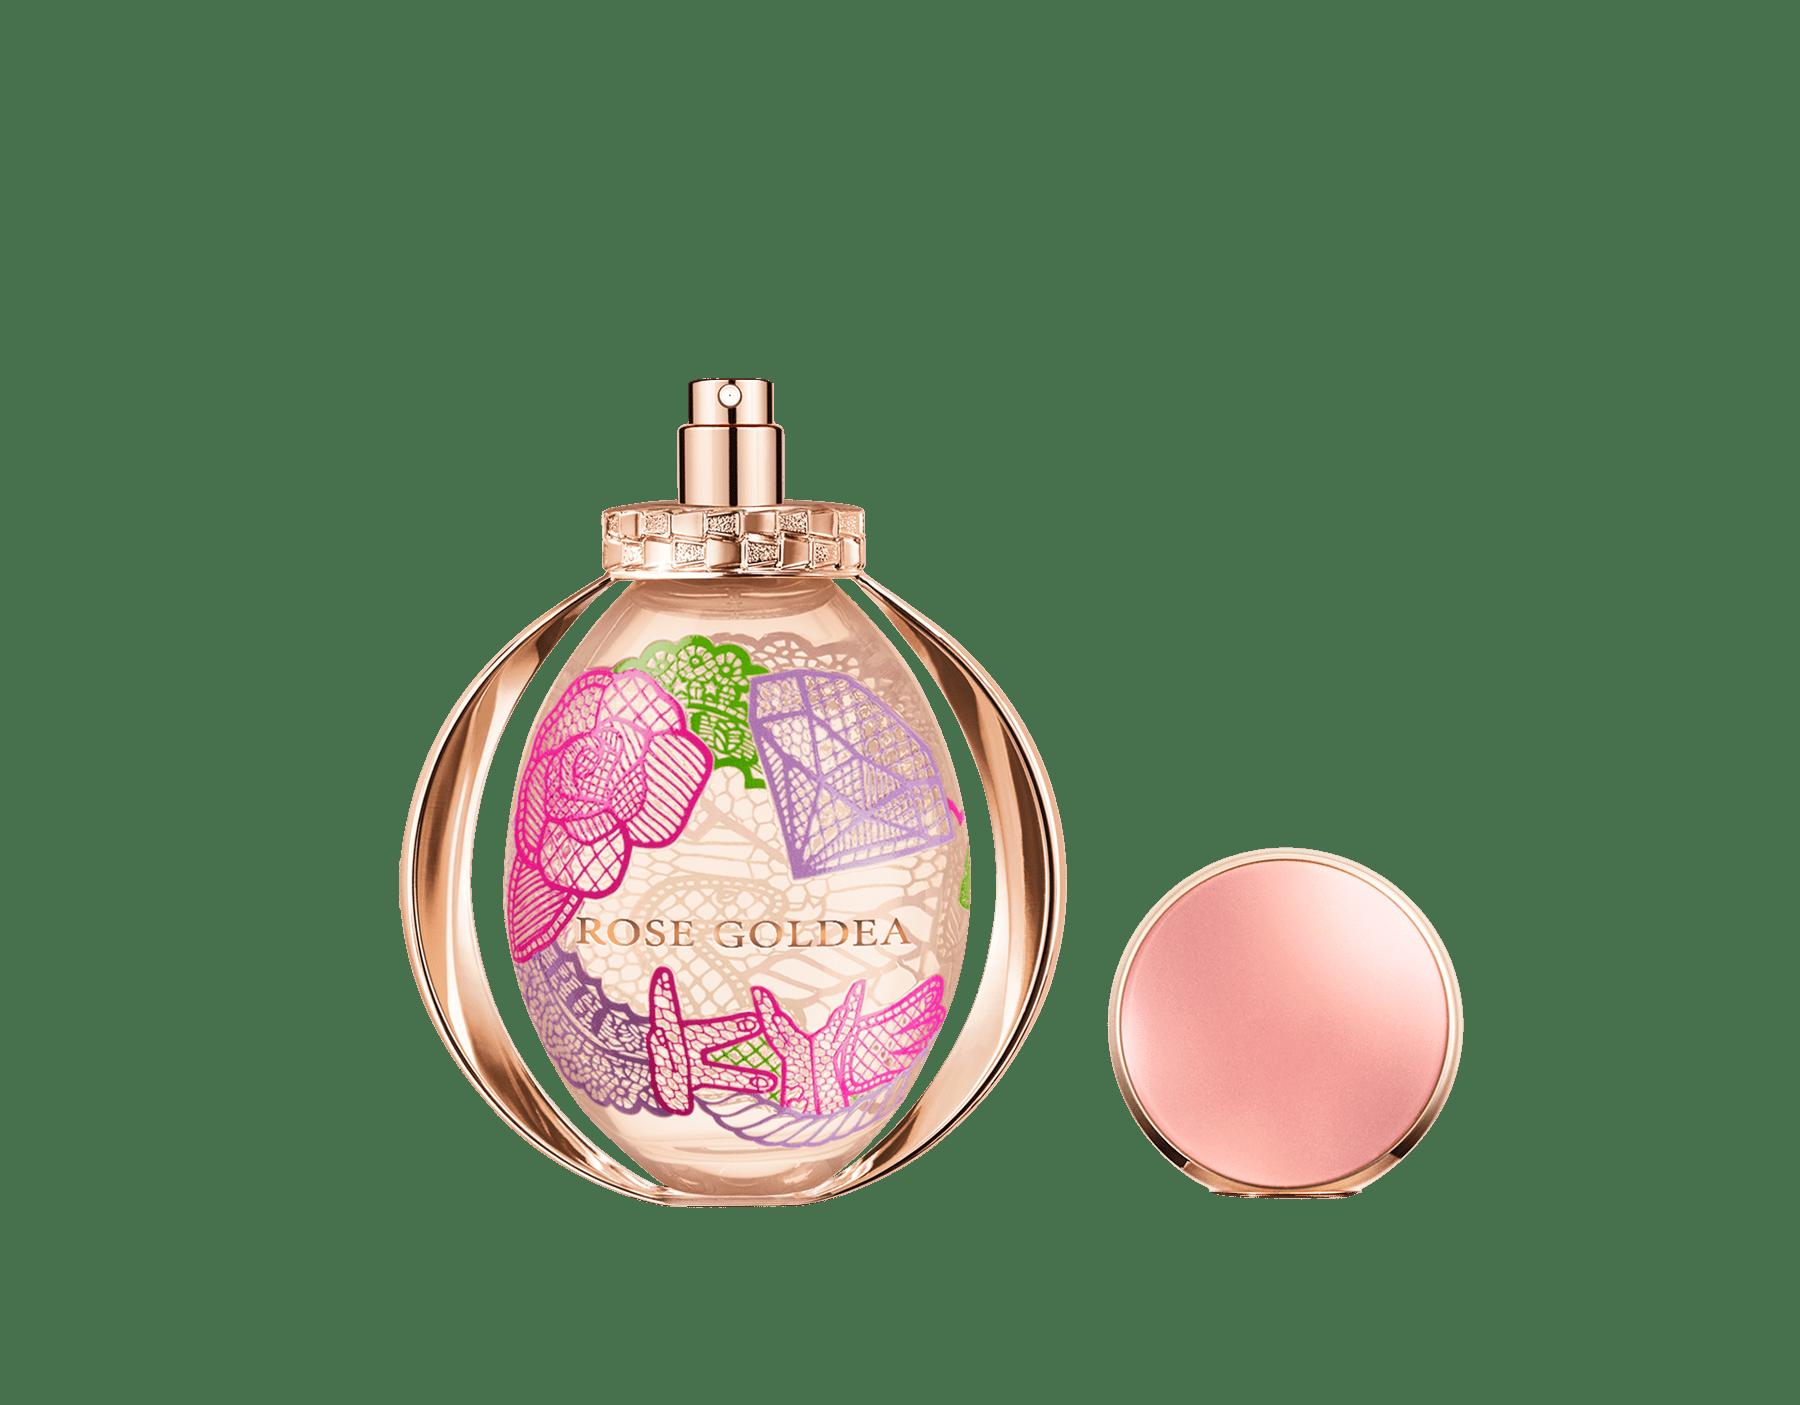 A new Limited Edition in collaboration with a Korean artist, Kathleen Kye, encapsulating the original Rose Goldea Eau de Parfum. 41150 image 3